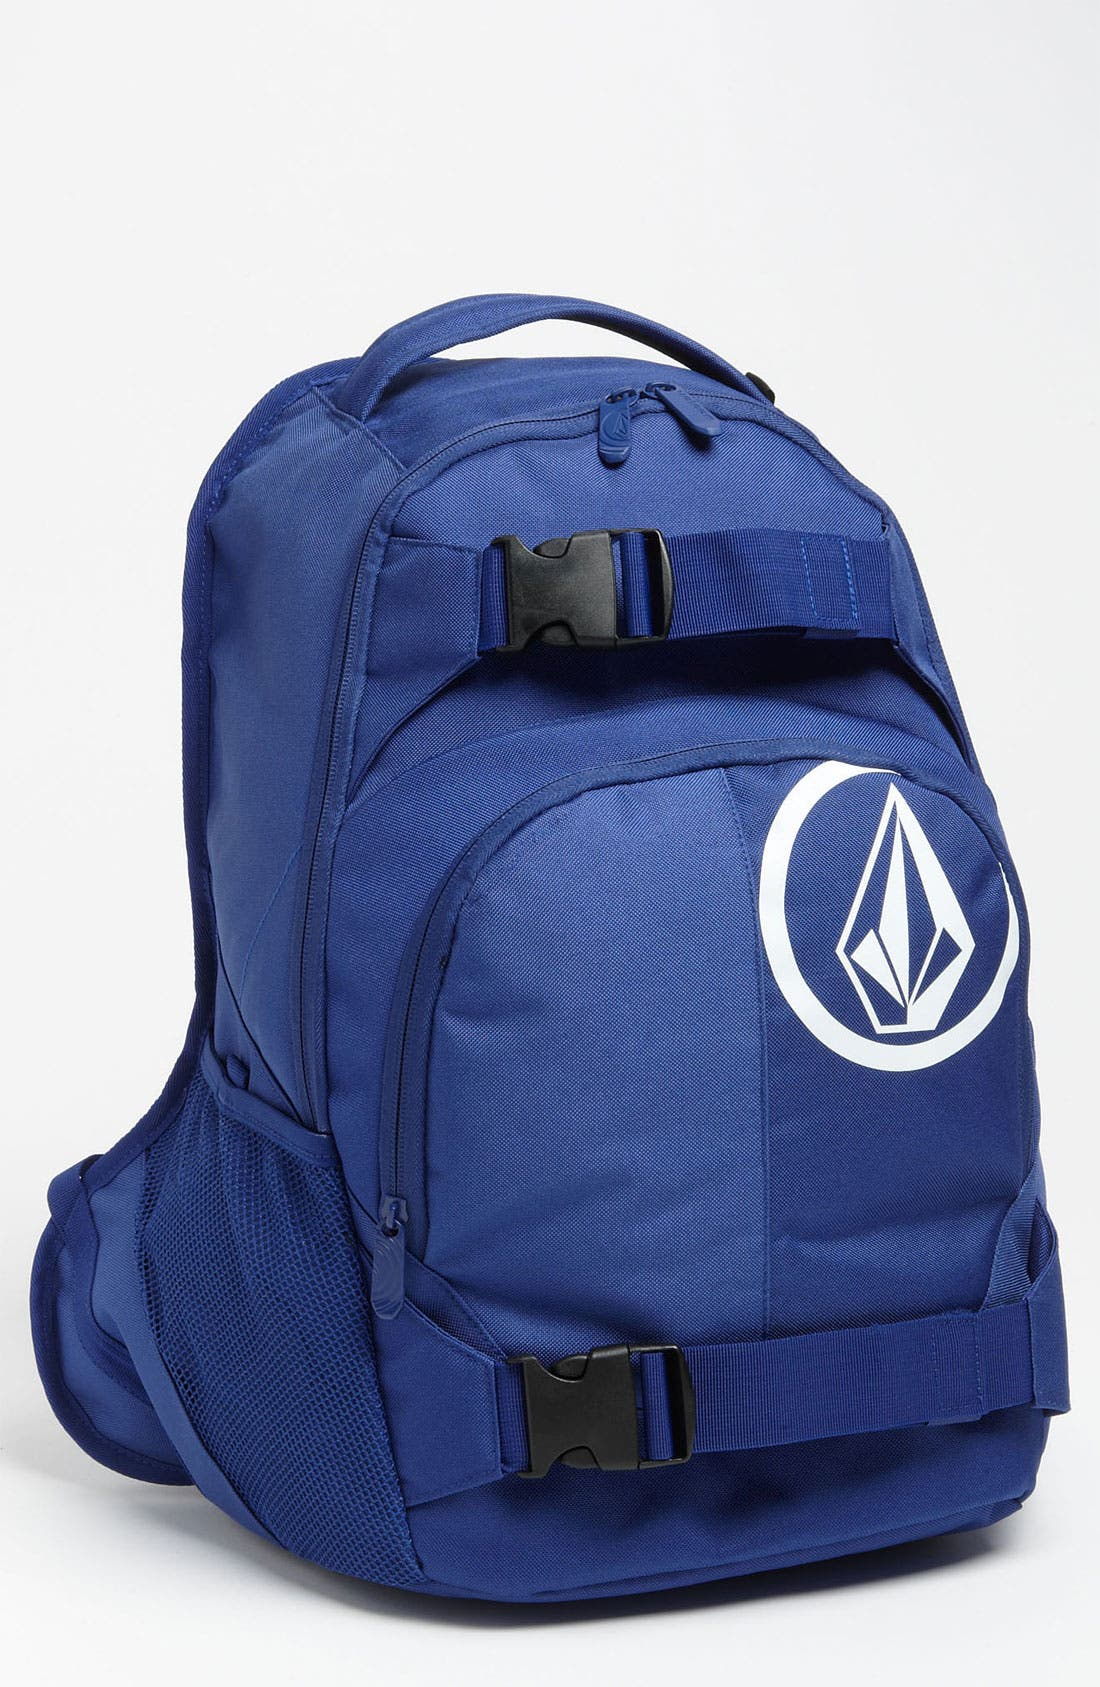 Alternate Image 1 Selected - Volcom 'Equilibrium' Backpack (Big Boys)